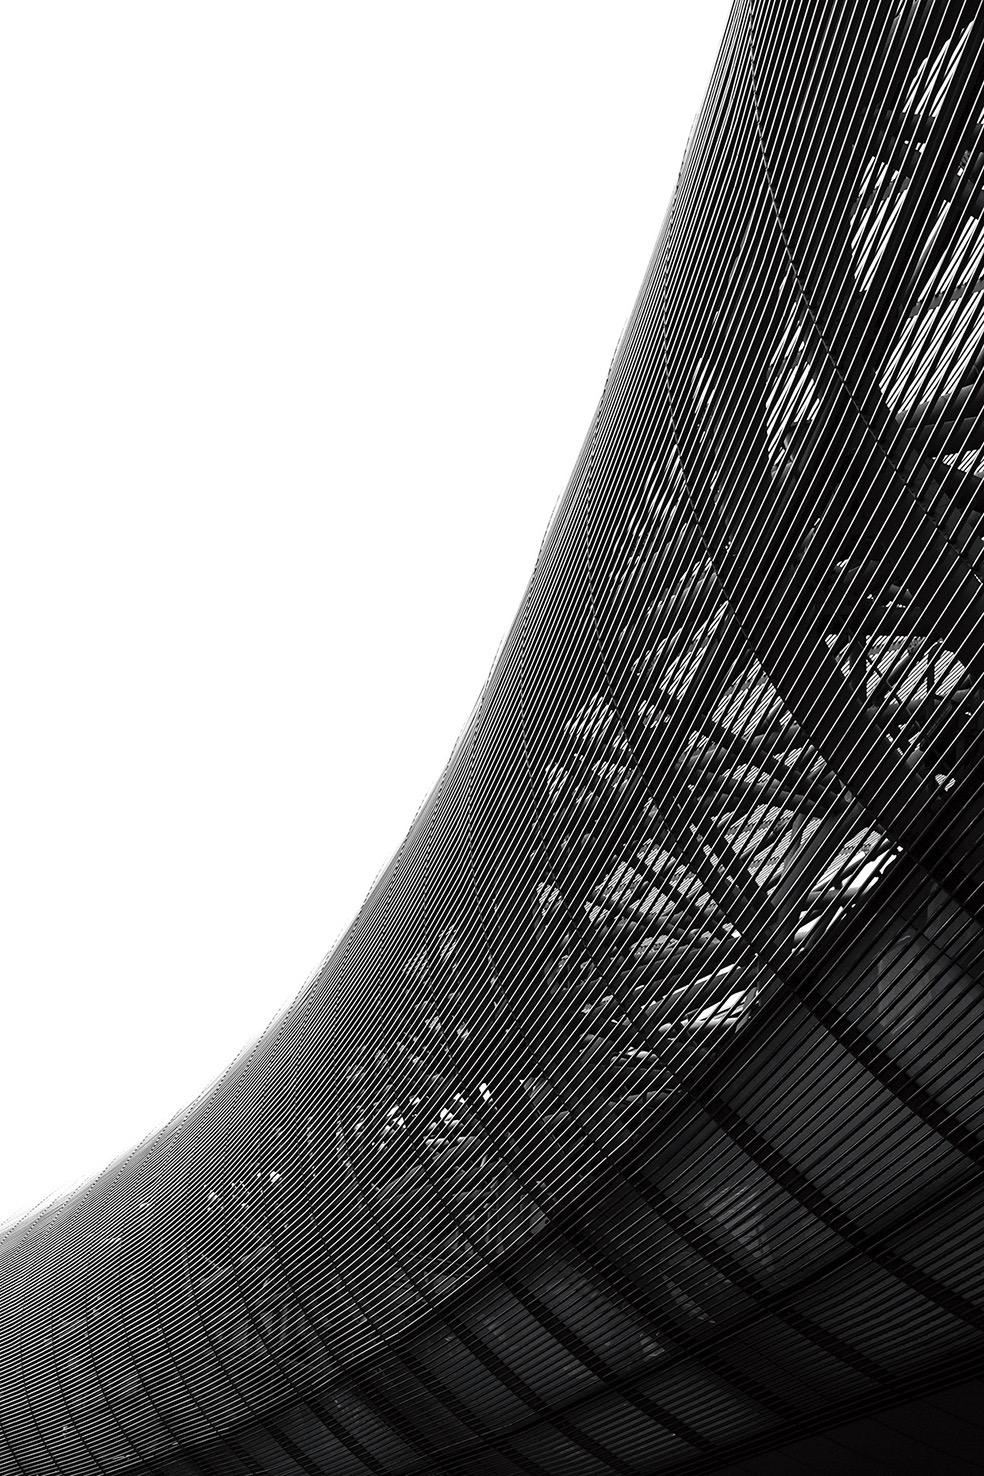 kevin_krautgartner-black_and_white-architecture_photography-photogrvphy_magazine_03